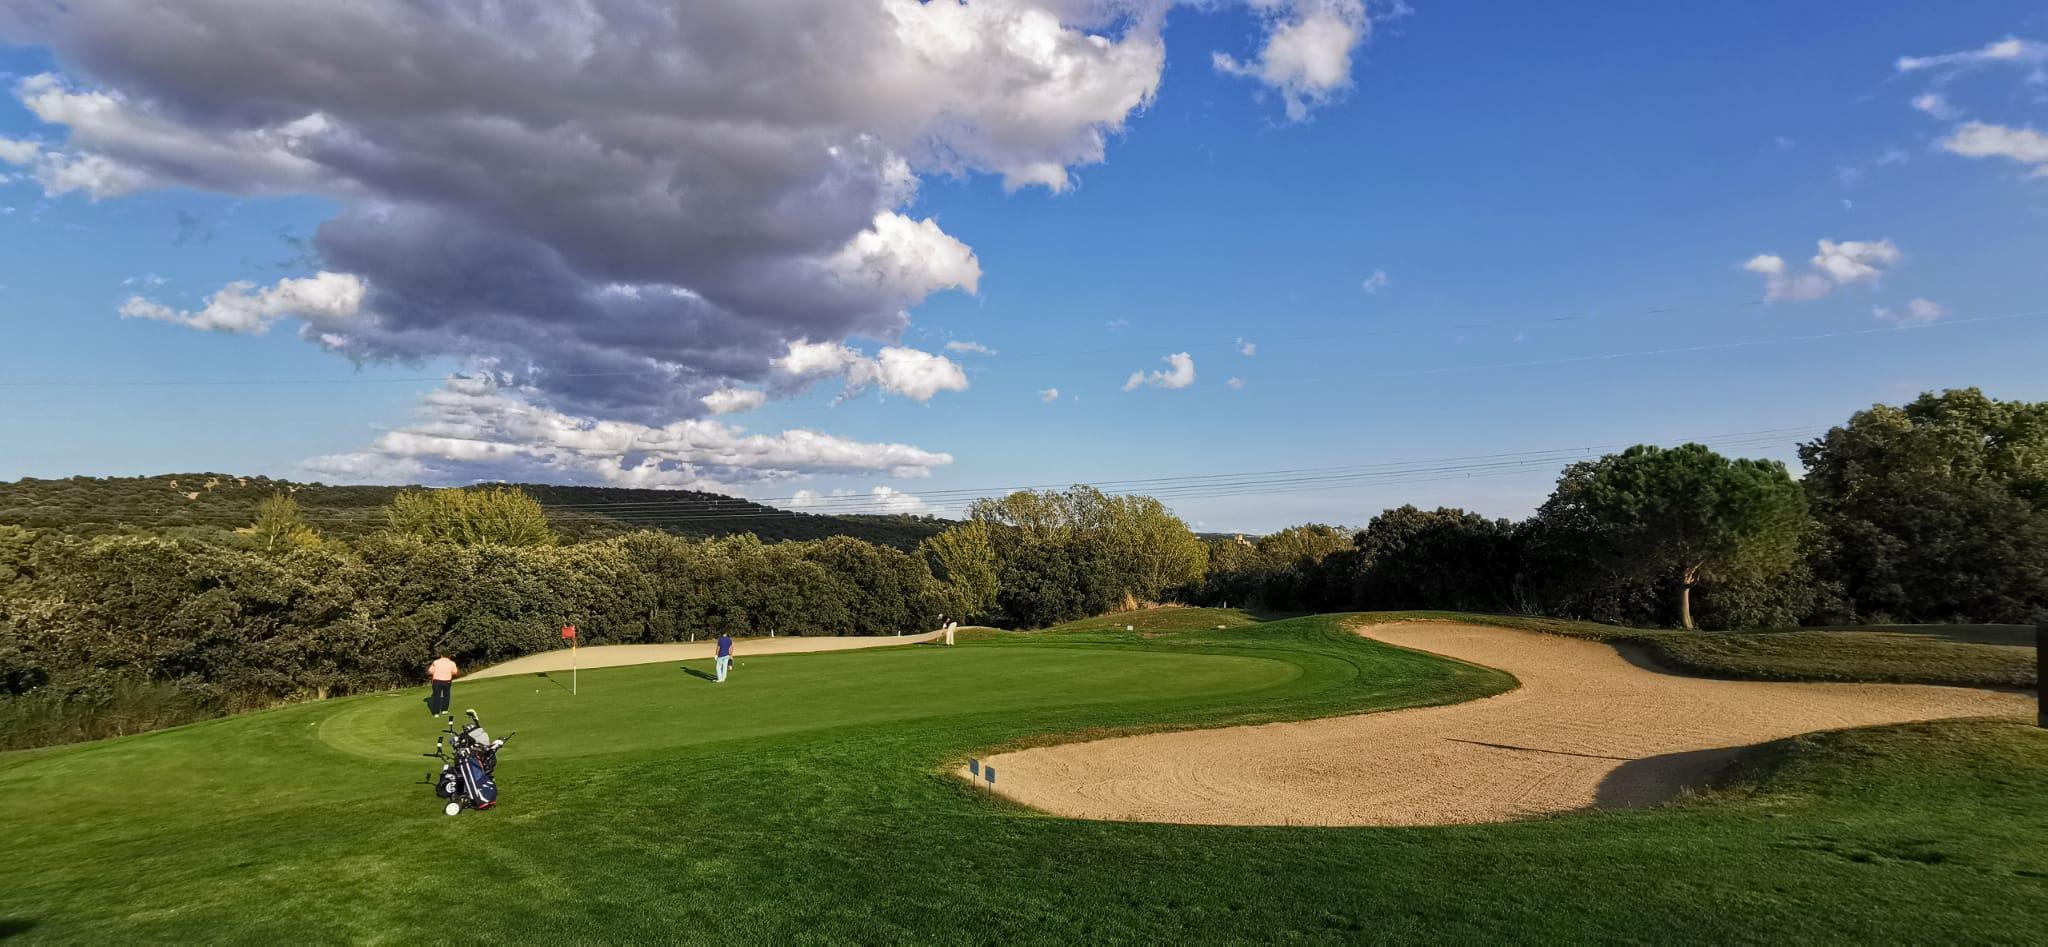 Torneo Influencers en Golf La Dehesa